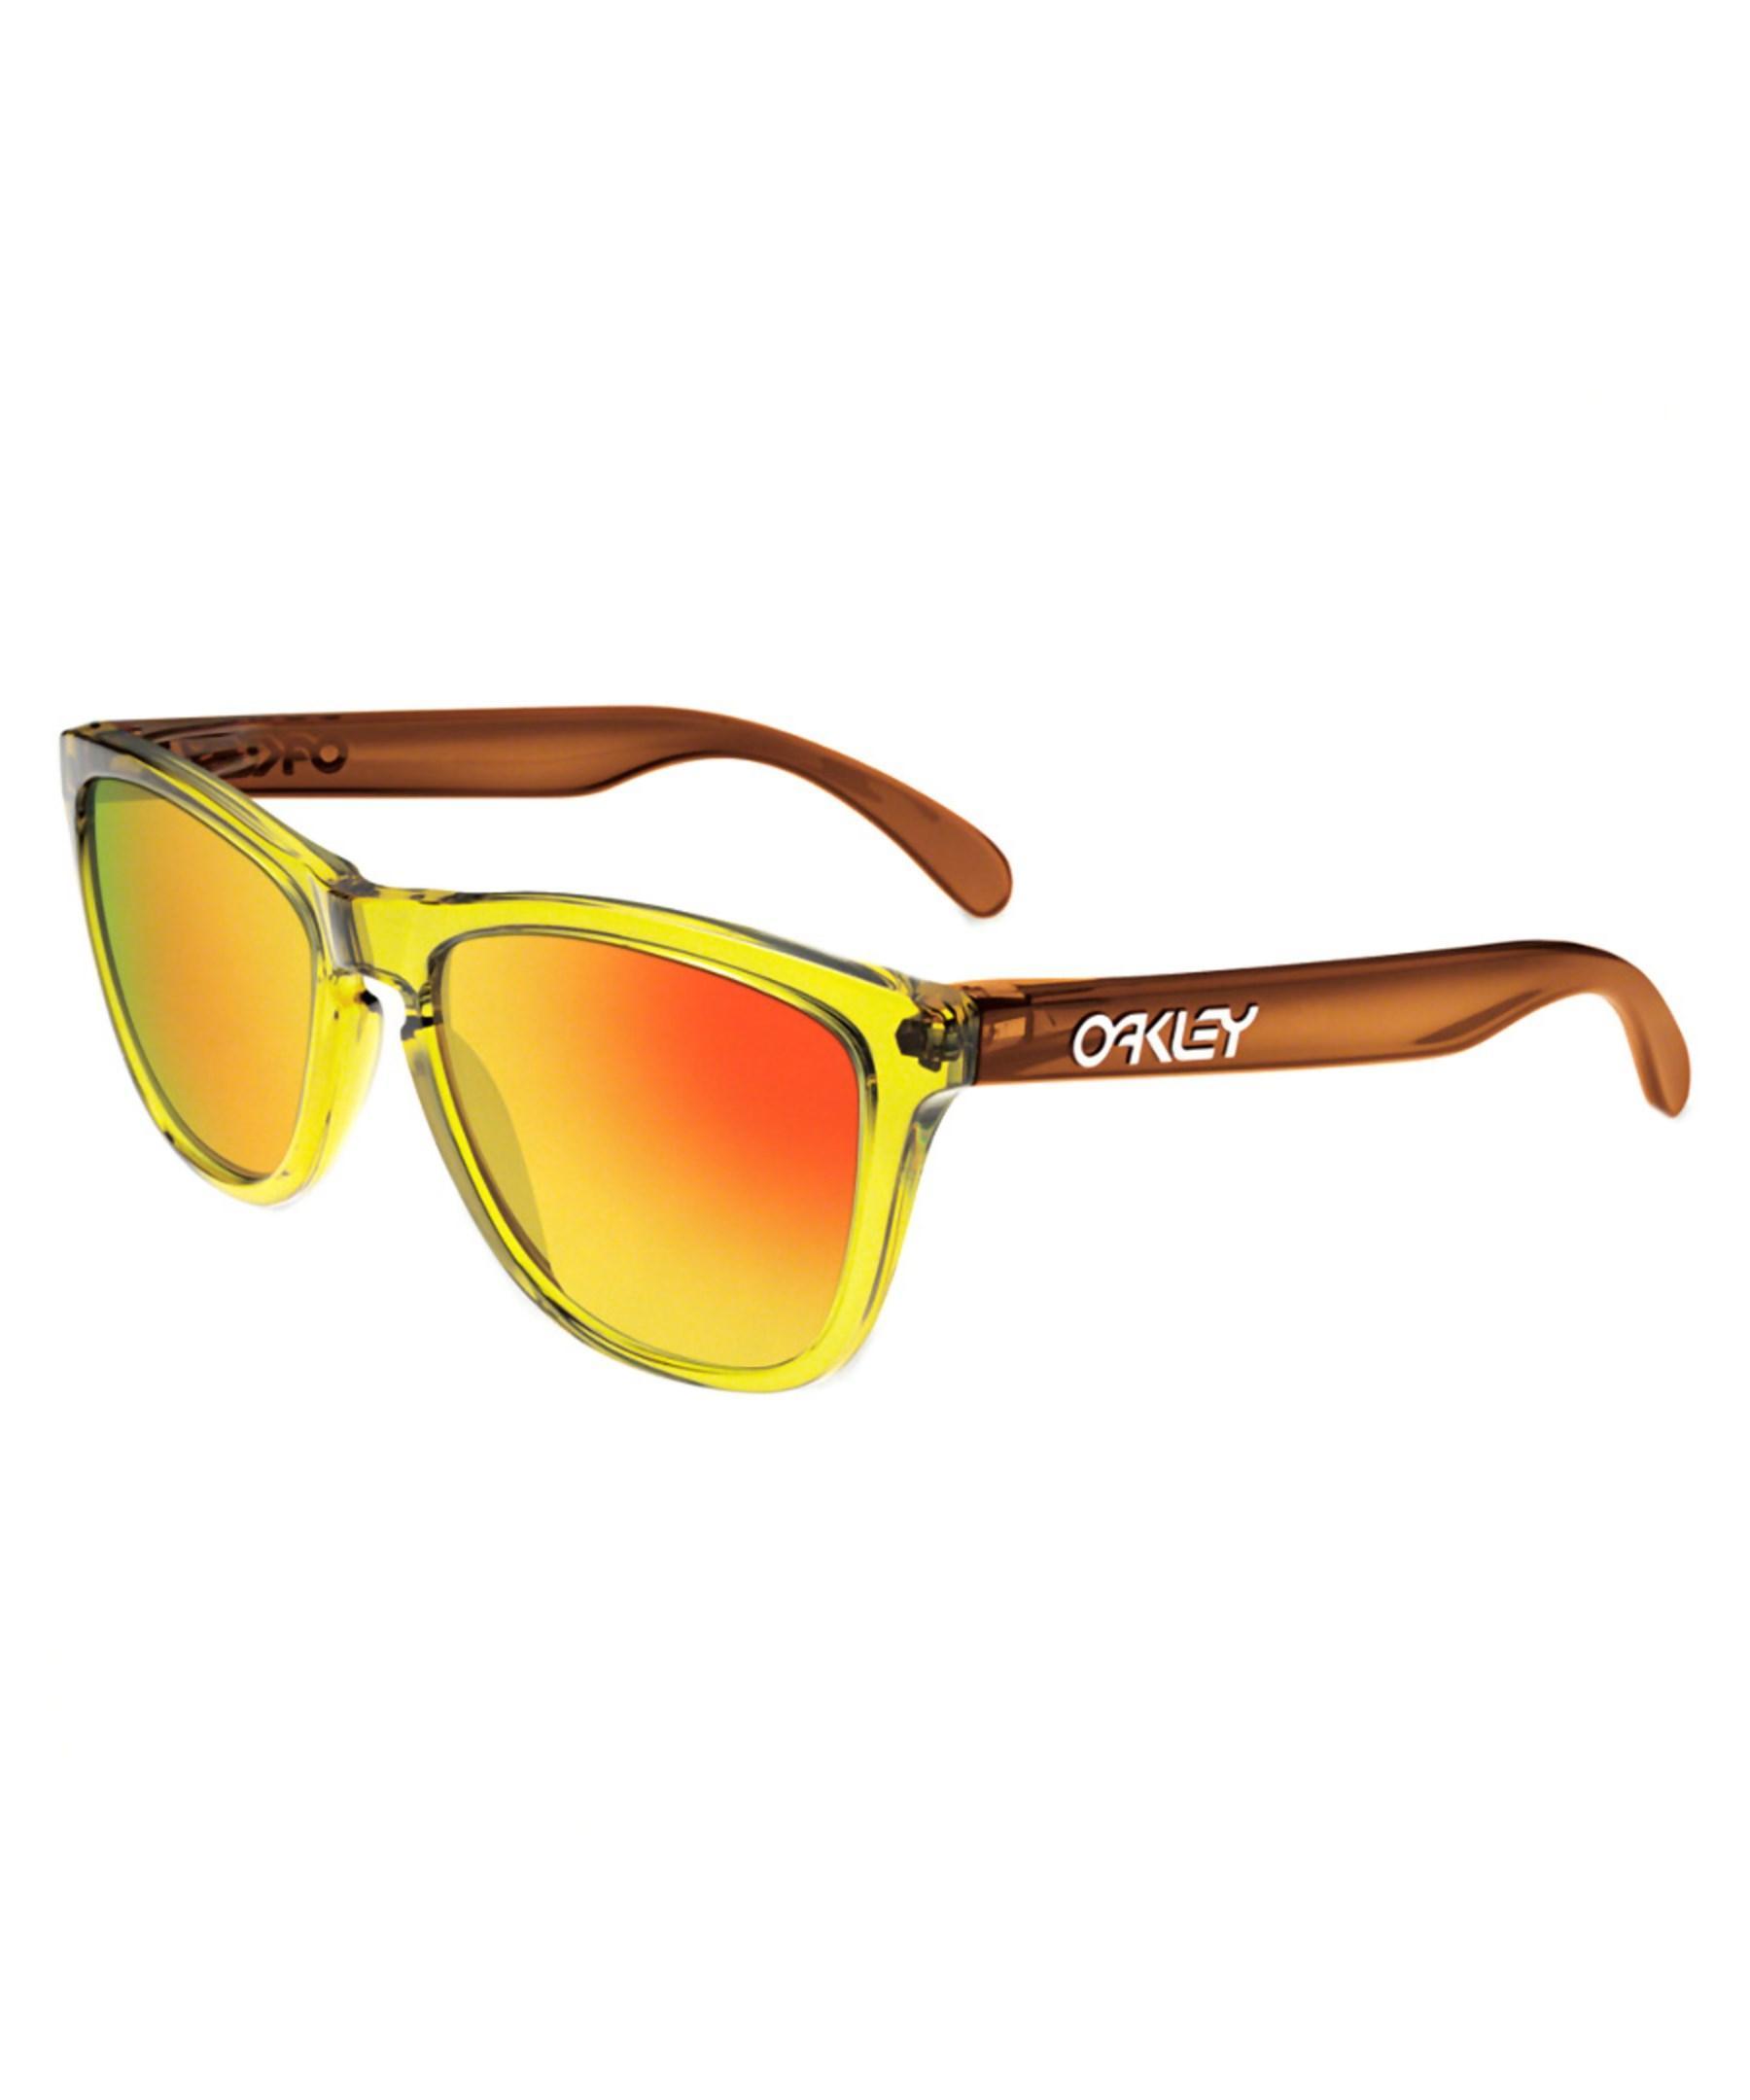 03f5876901 Oakley Frogskin Polarized Brown « Heritage Malta